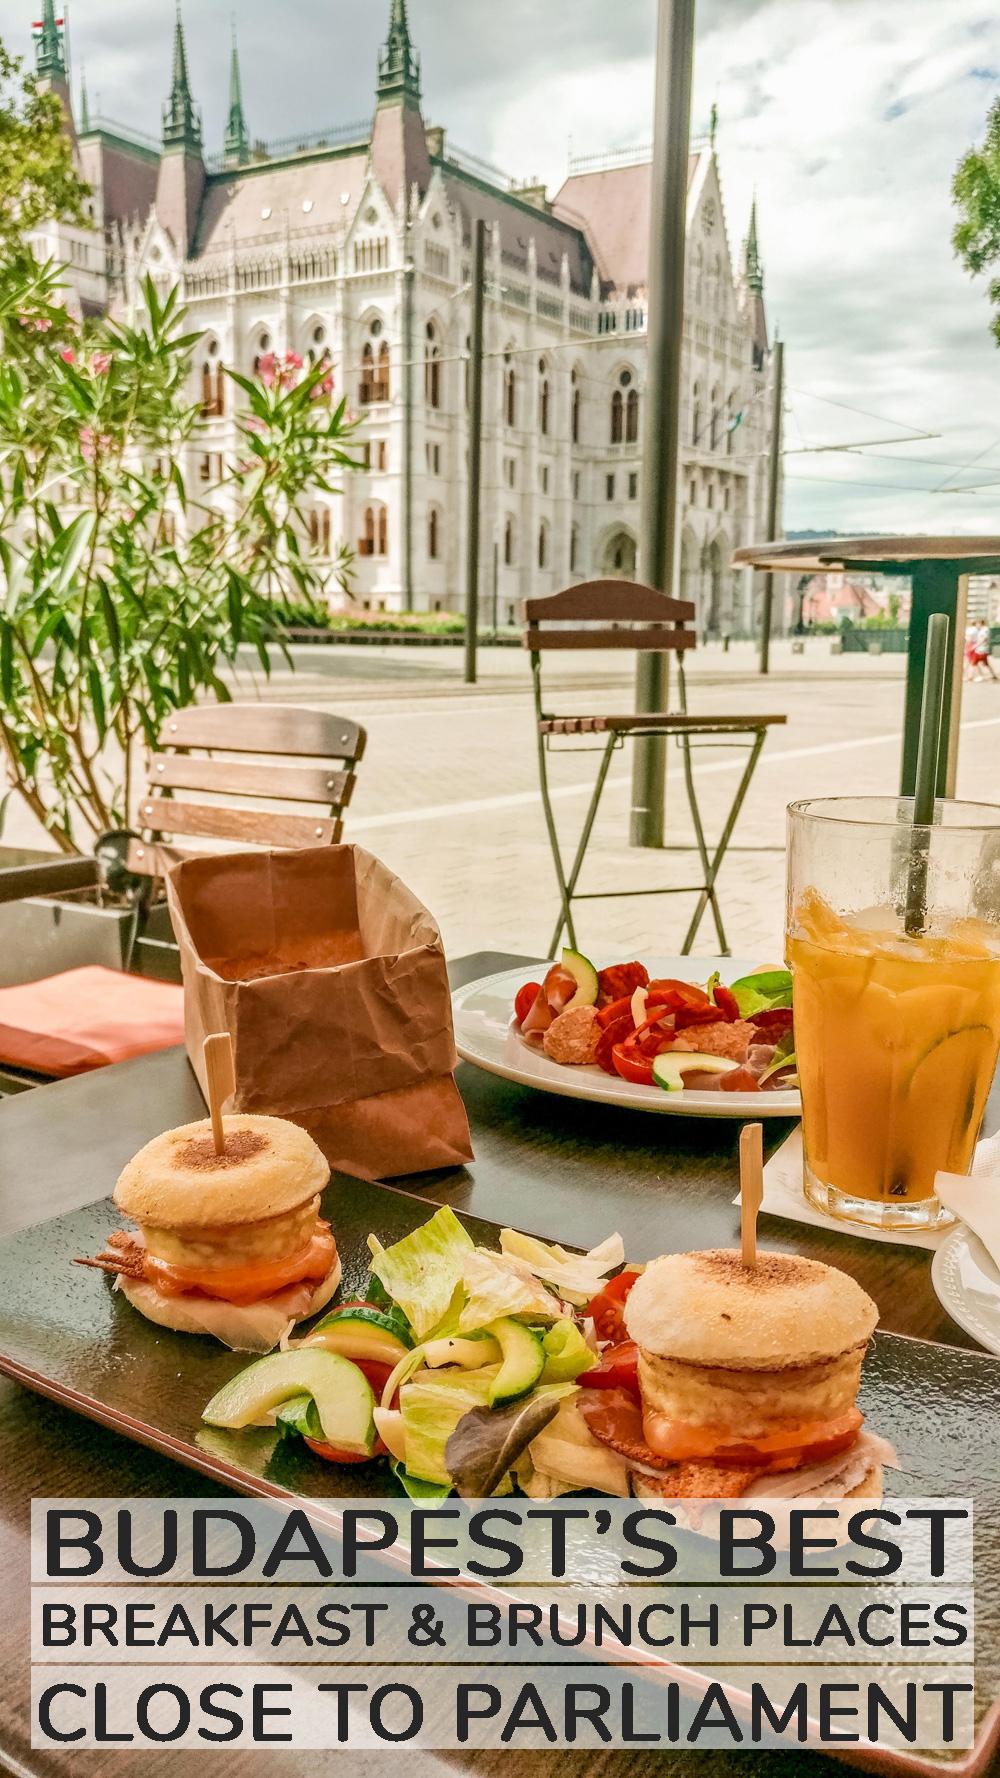 Budapest's best breakfast & brunch places close to the Parliament | Aliz's Wonderland